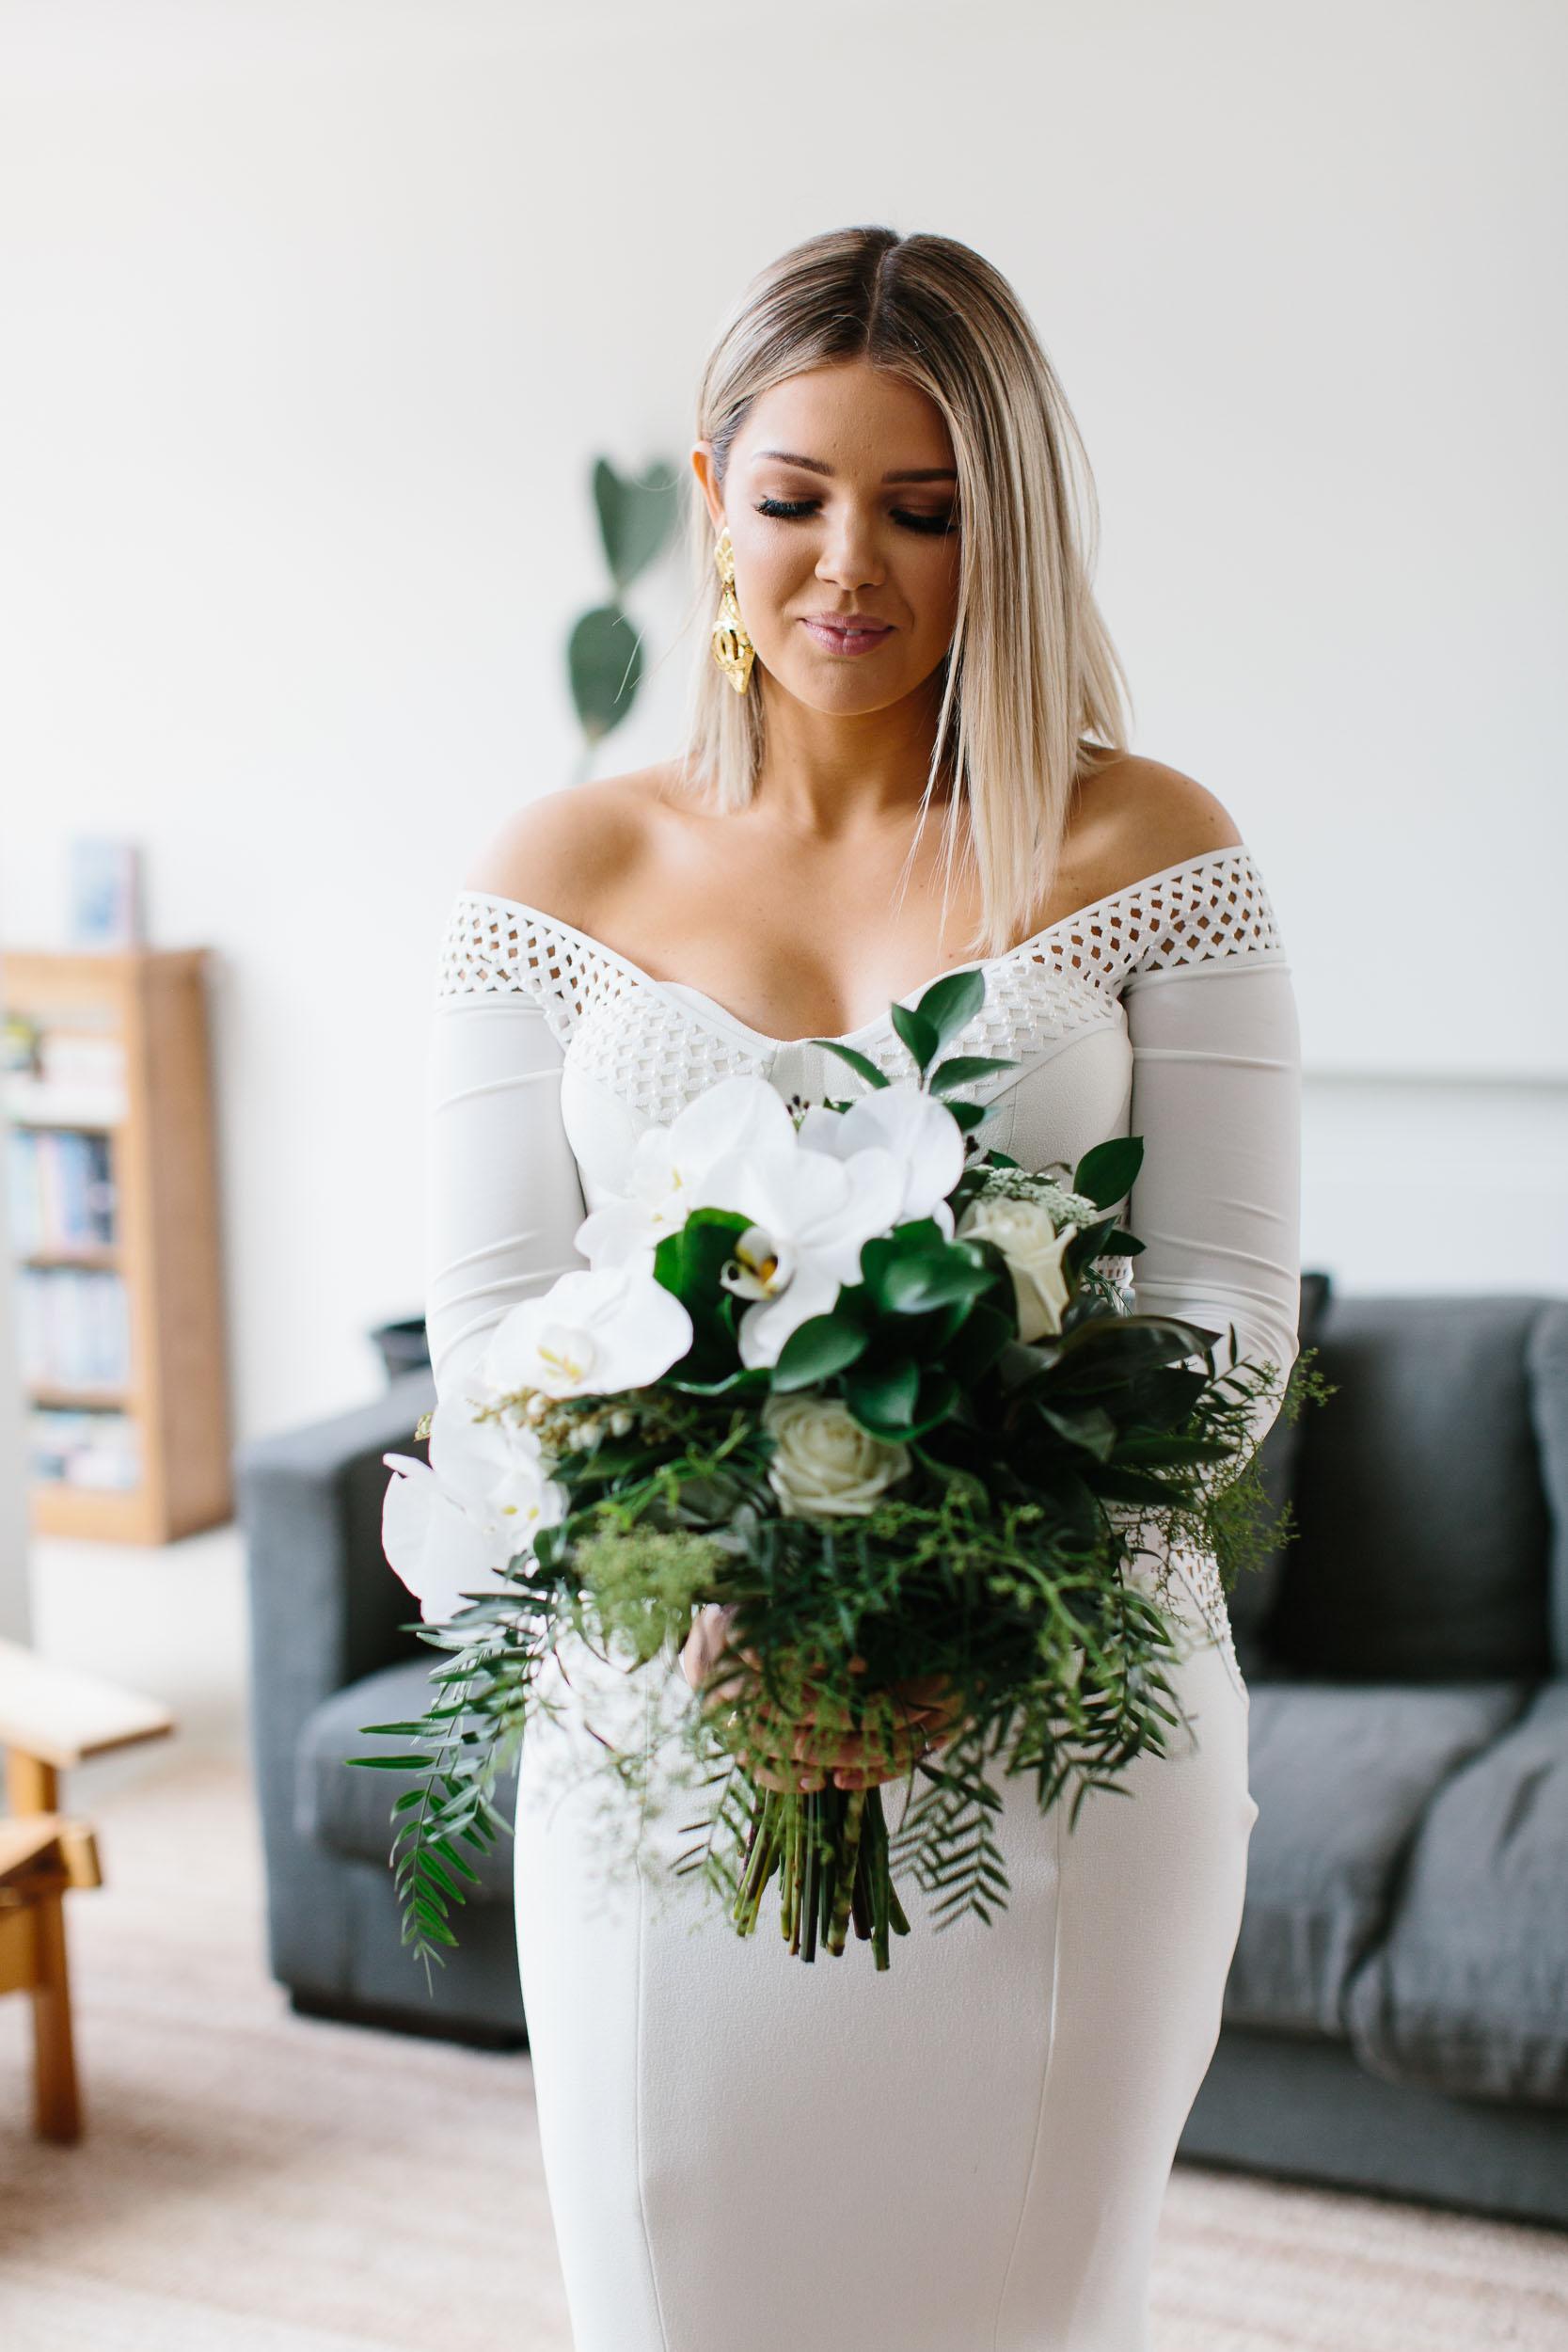 Kas-Richards-Urban-Melbourne-Wedding-Jason-Grech-171.jpg